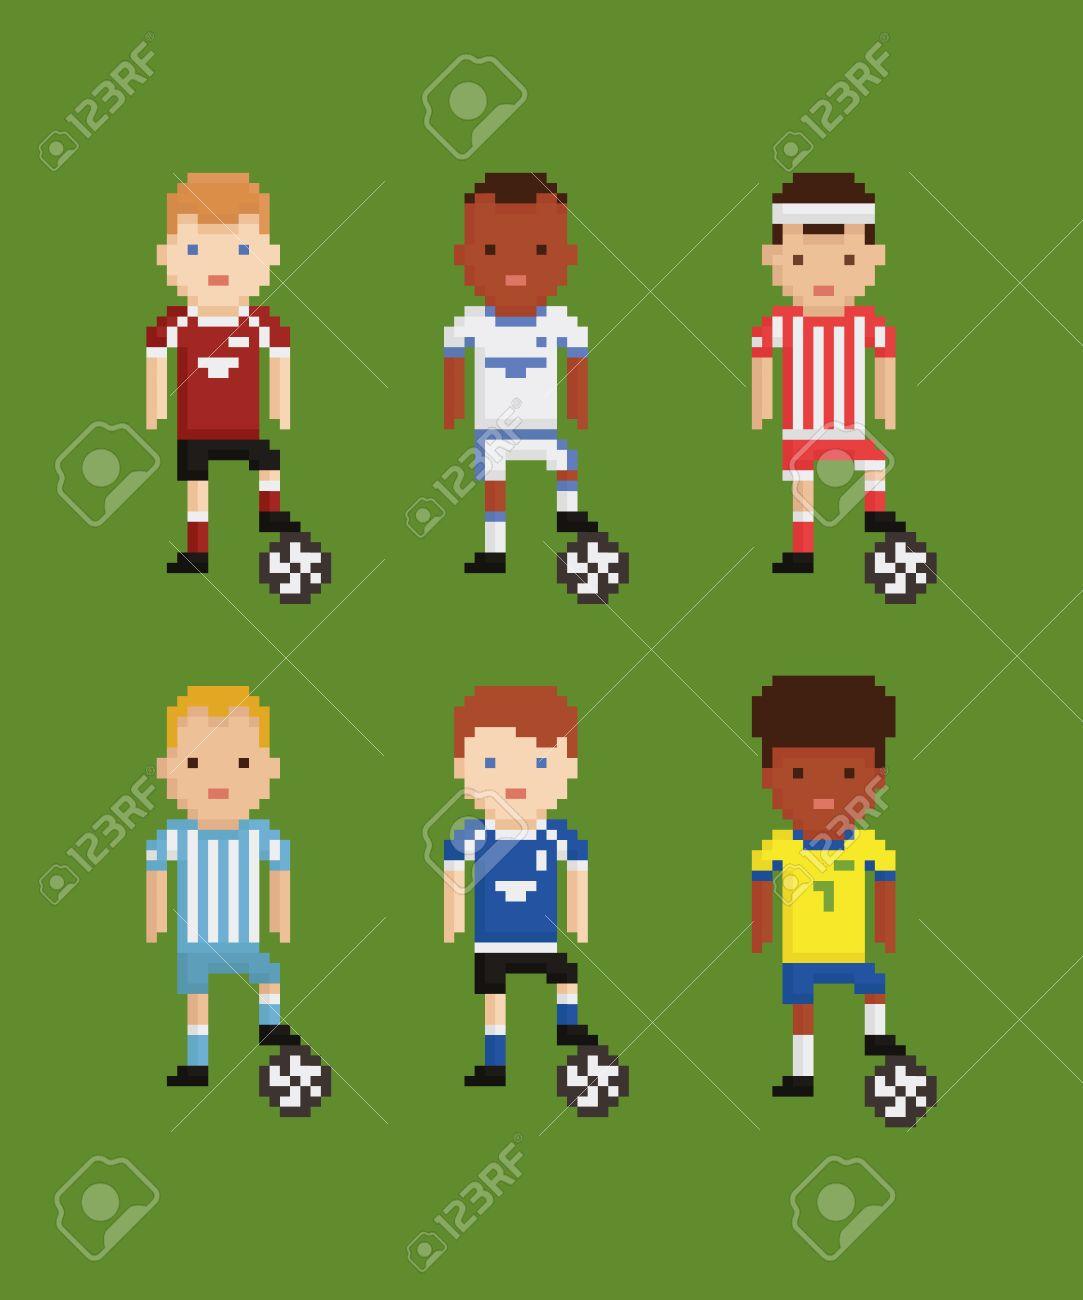 Pixel Art Logo De Football